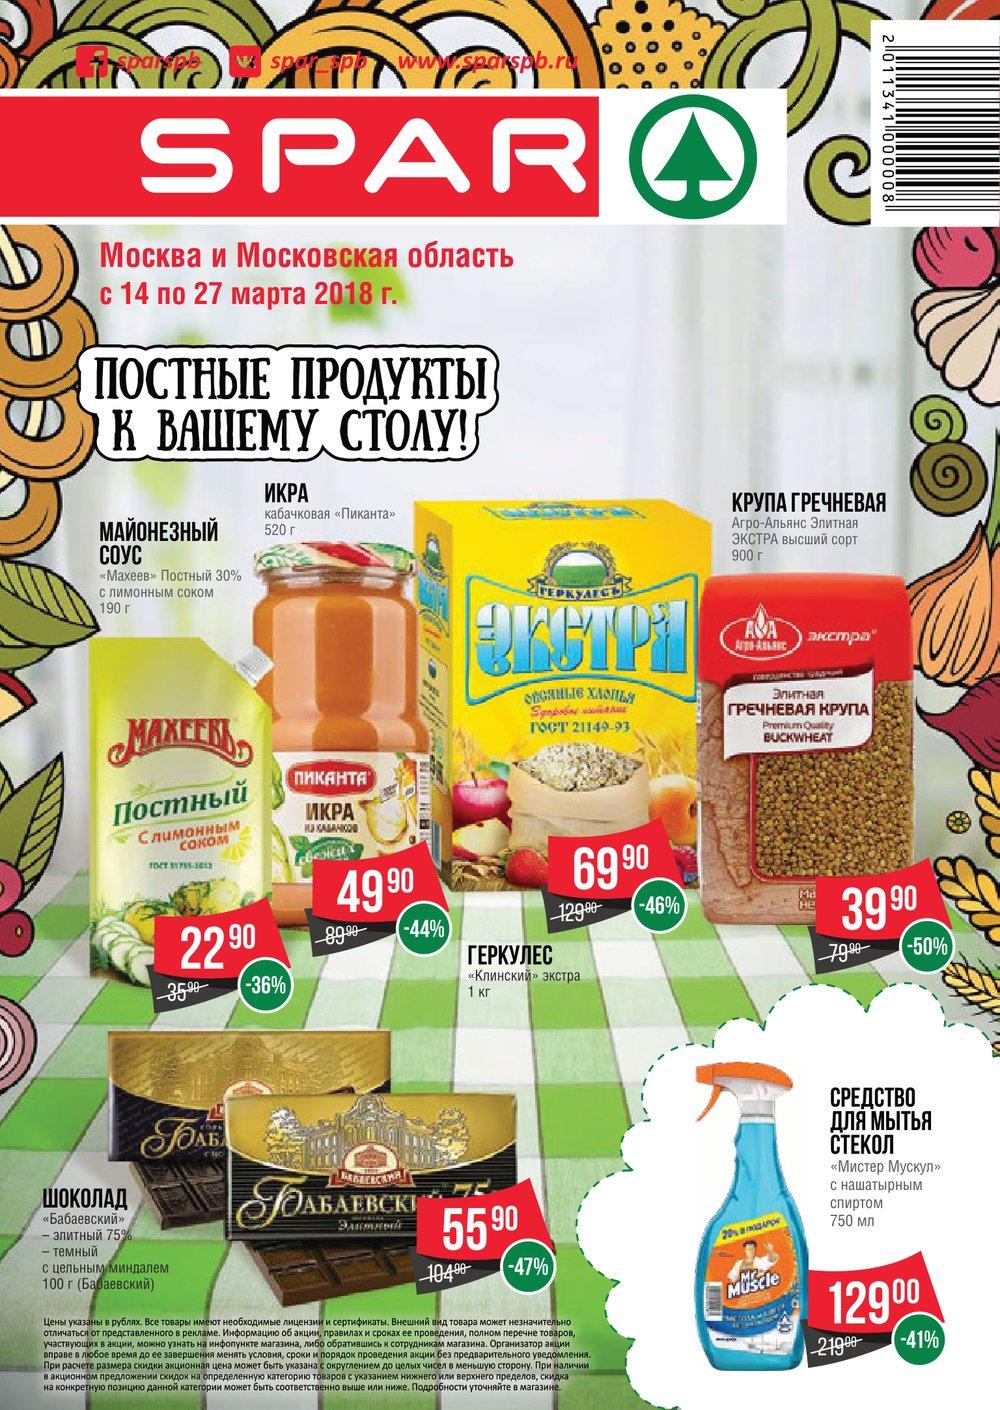 Каталог акций Spar с 14 по 27 марта 2018 - стр. 1